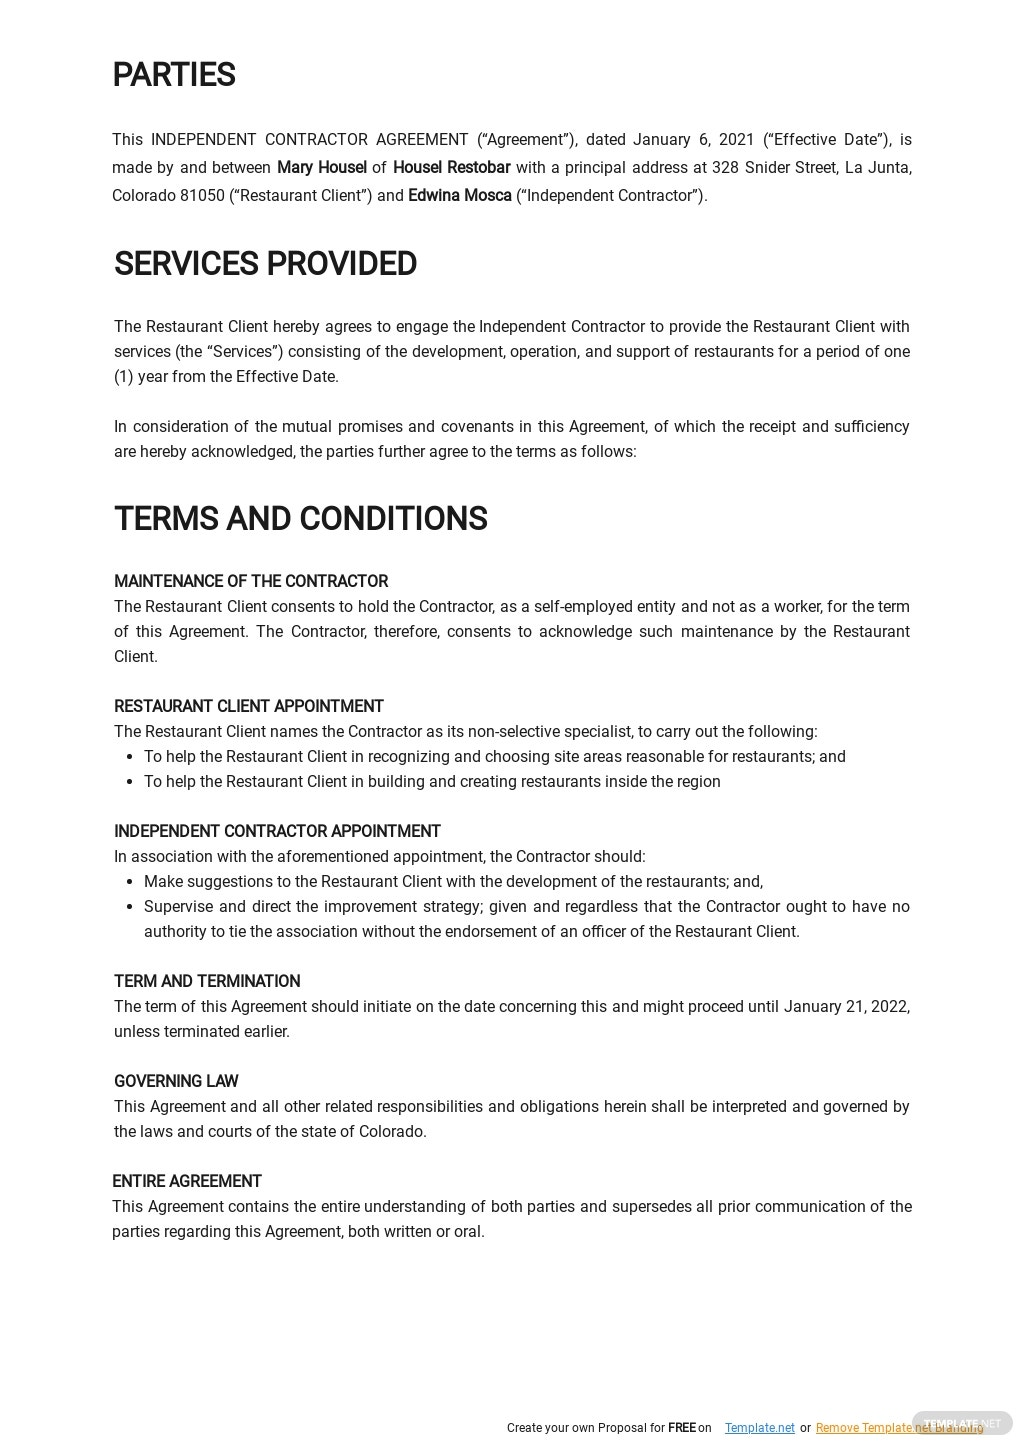 Restaurant Independent Contractor Agreement Template 1.jpe